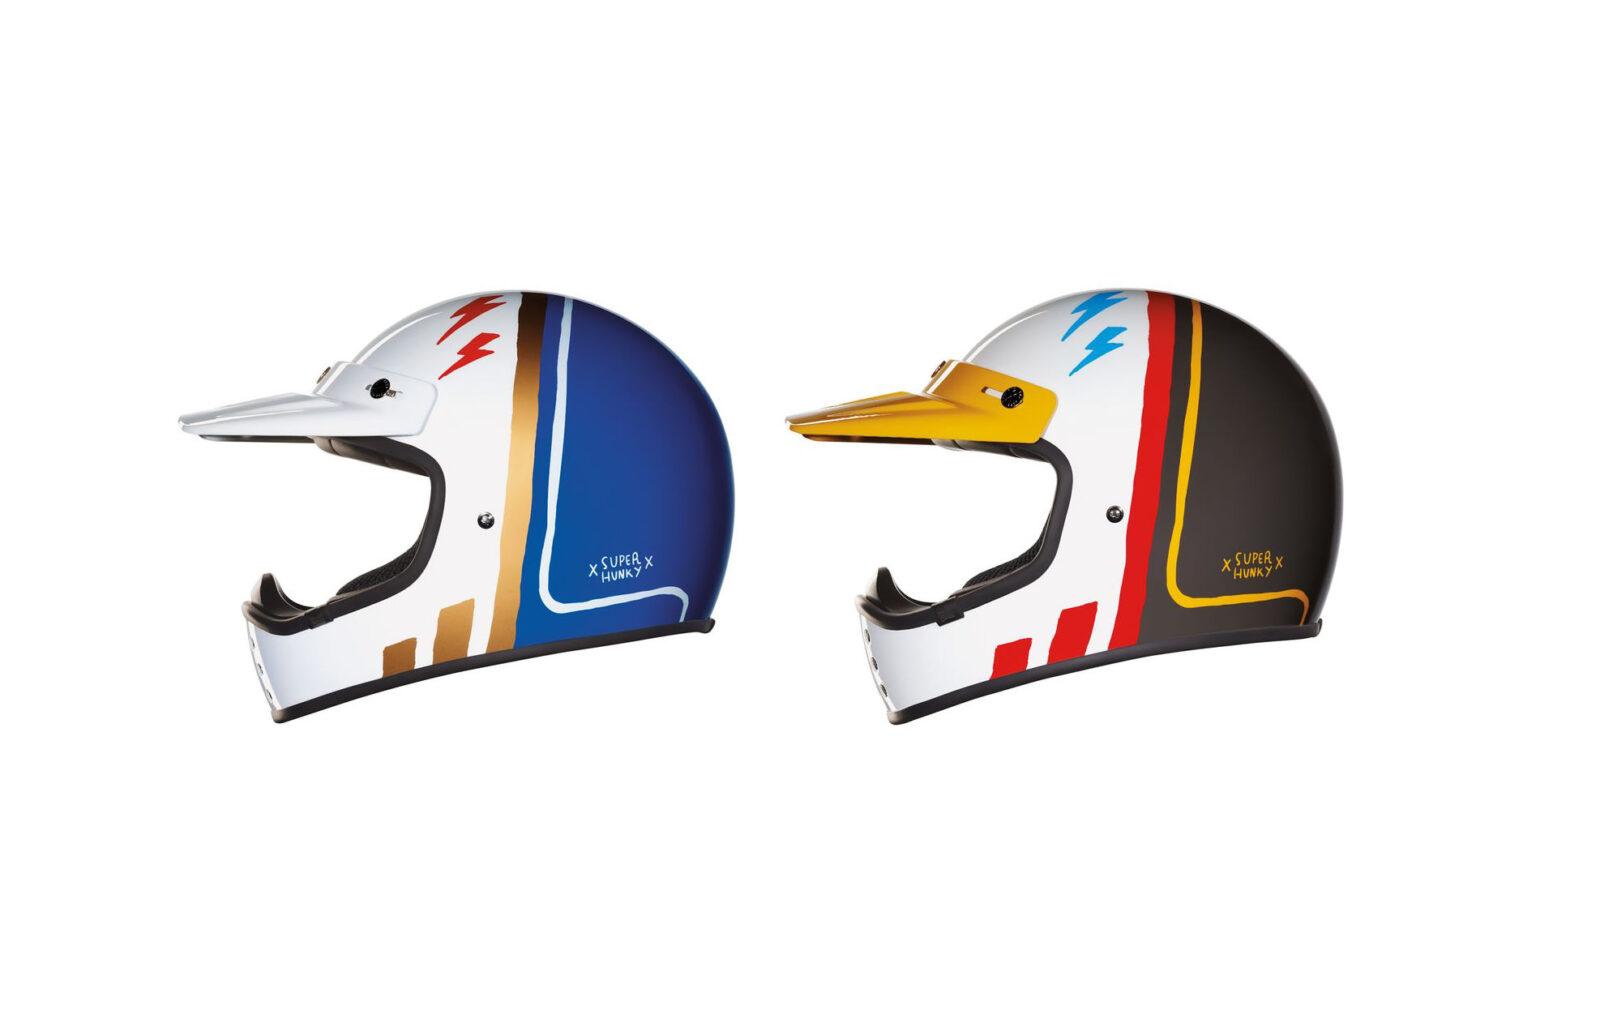 Nexx XG200 Offroad Superhunky Helmet Main 1600x1032 - Nexx X.G200 Offroad Superhunky Helmet